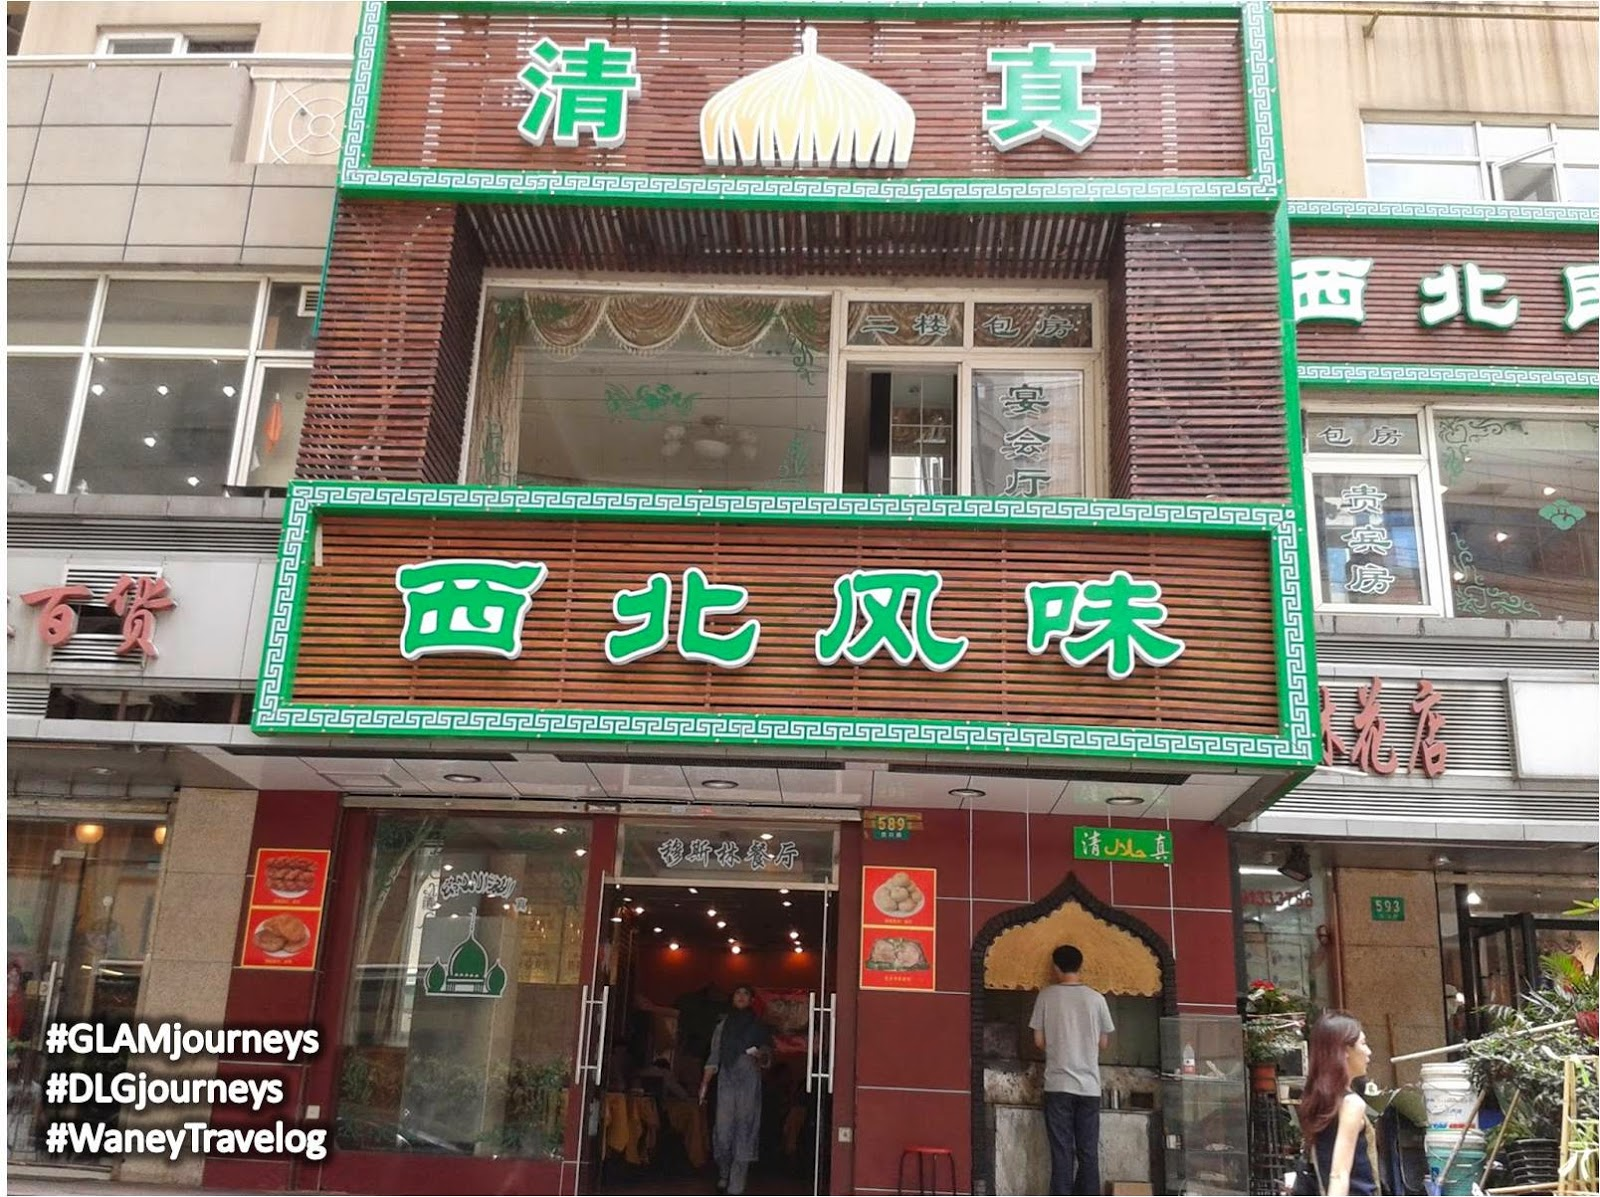 pakej melancong Shanghai, Halal Food in Shanghai, Halal Restaurant in Shanghai, Shanghai Hetaiyuan North-west Flavour Restaurant (Halal Food), Hankou Road Shanghai, Glam Journeys, DLG Journeys, Waney Travelog, Jalan-jalan cari makan, rasa halal orient, melancong percuma, cuti-cuti malaysia, Waney Zainuddin